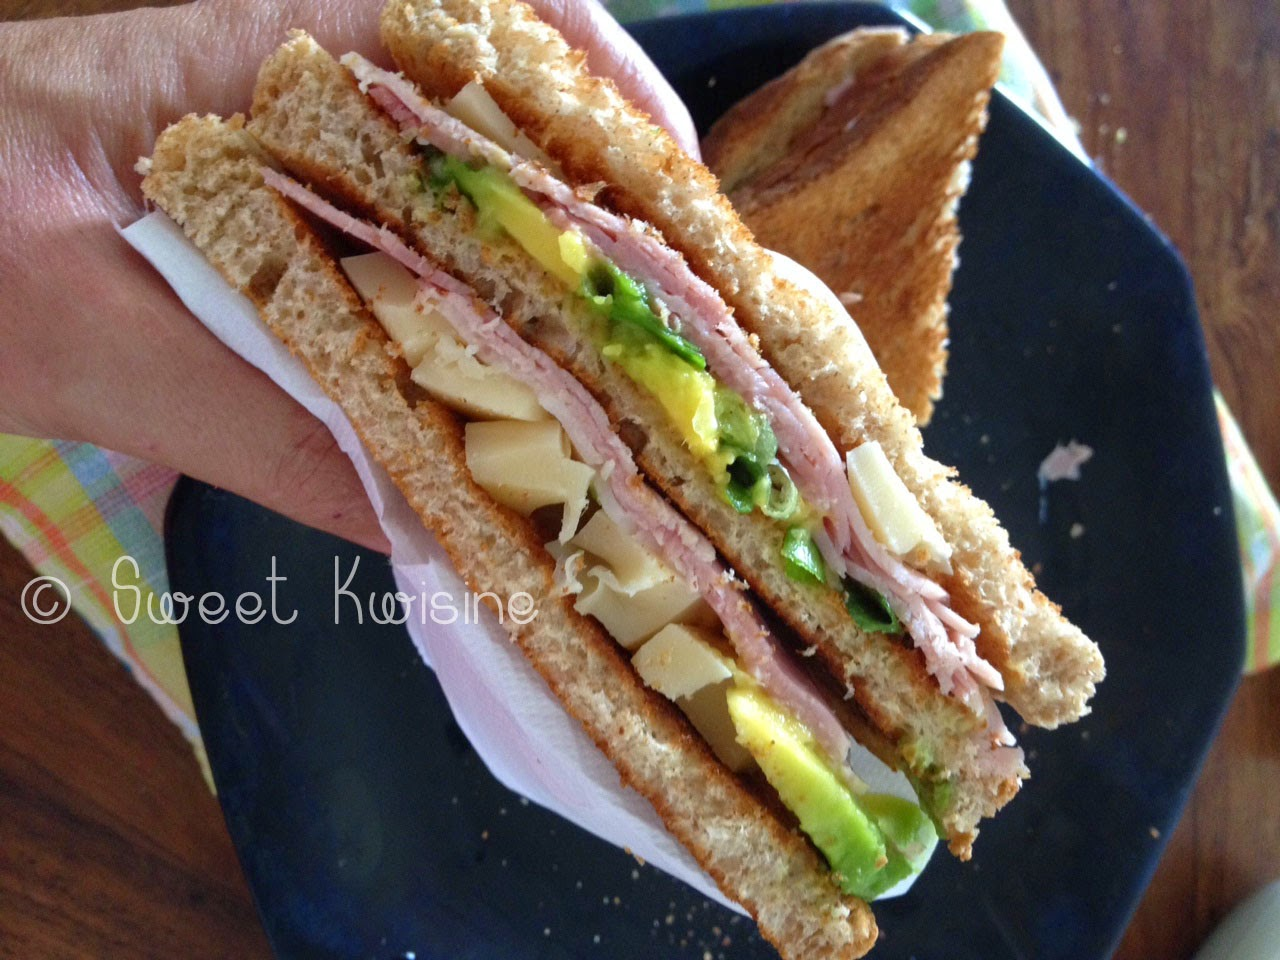 sweet kwisine, sandwiche, club, jambon, avocat, ham, avocado, healthy food, cuisine légère, recette